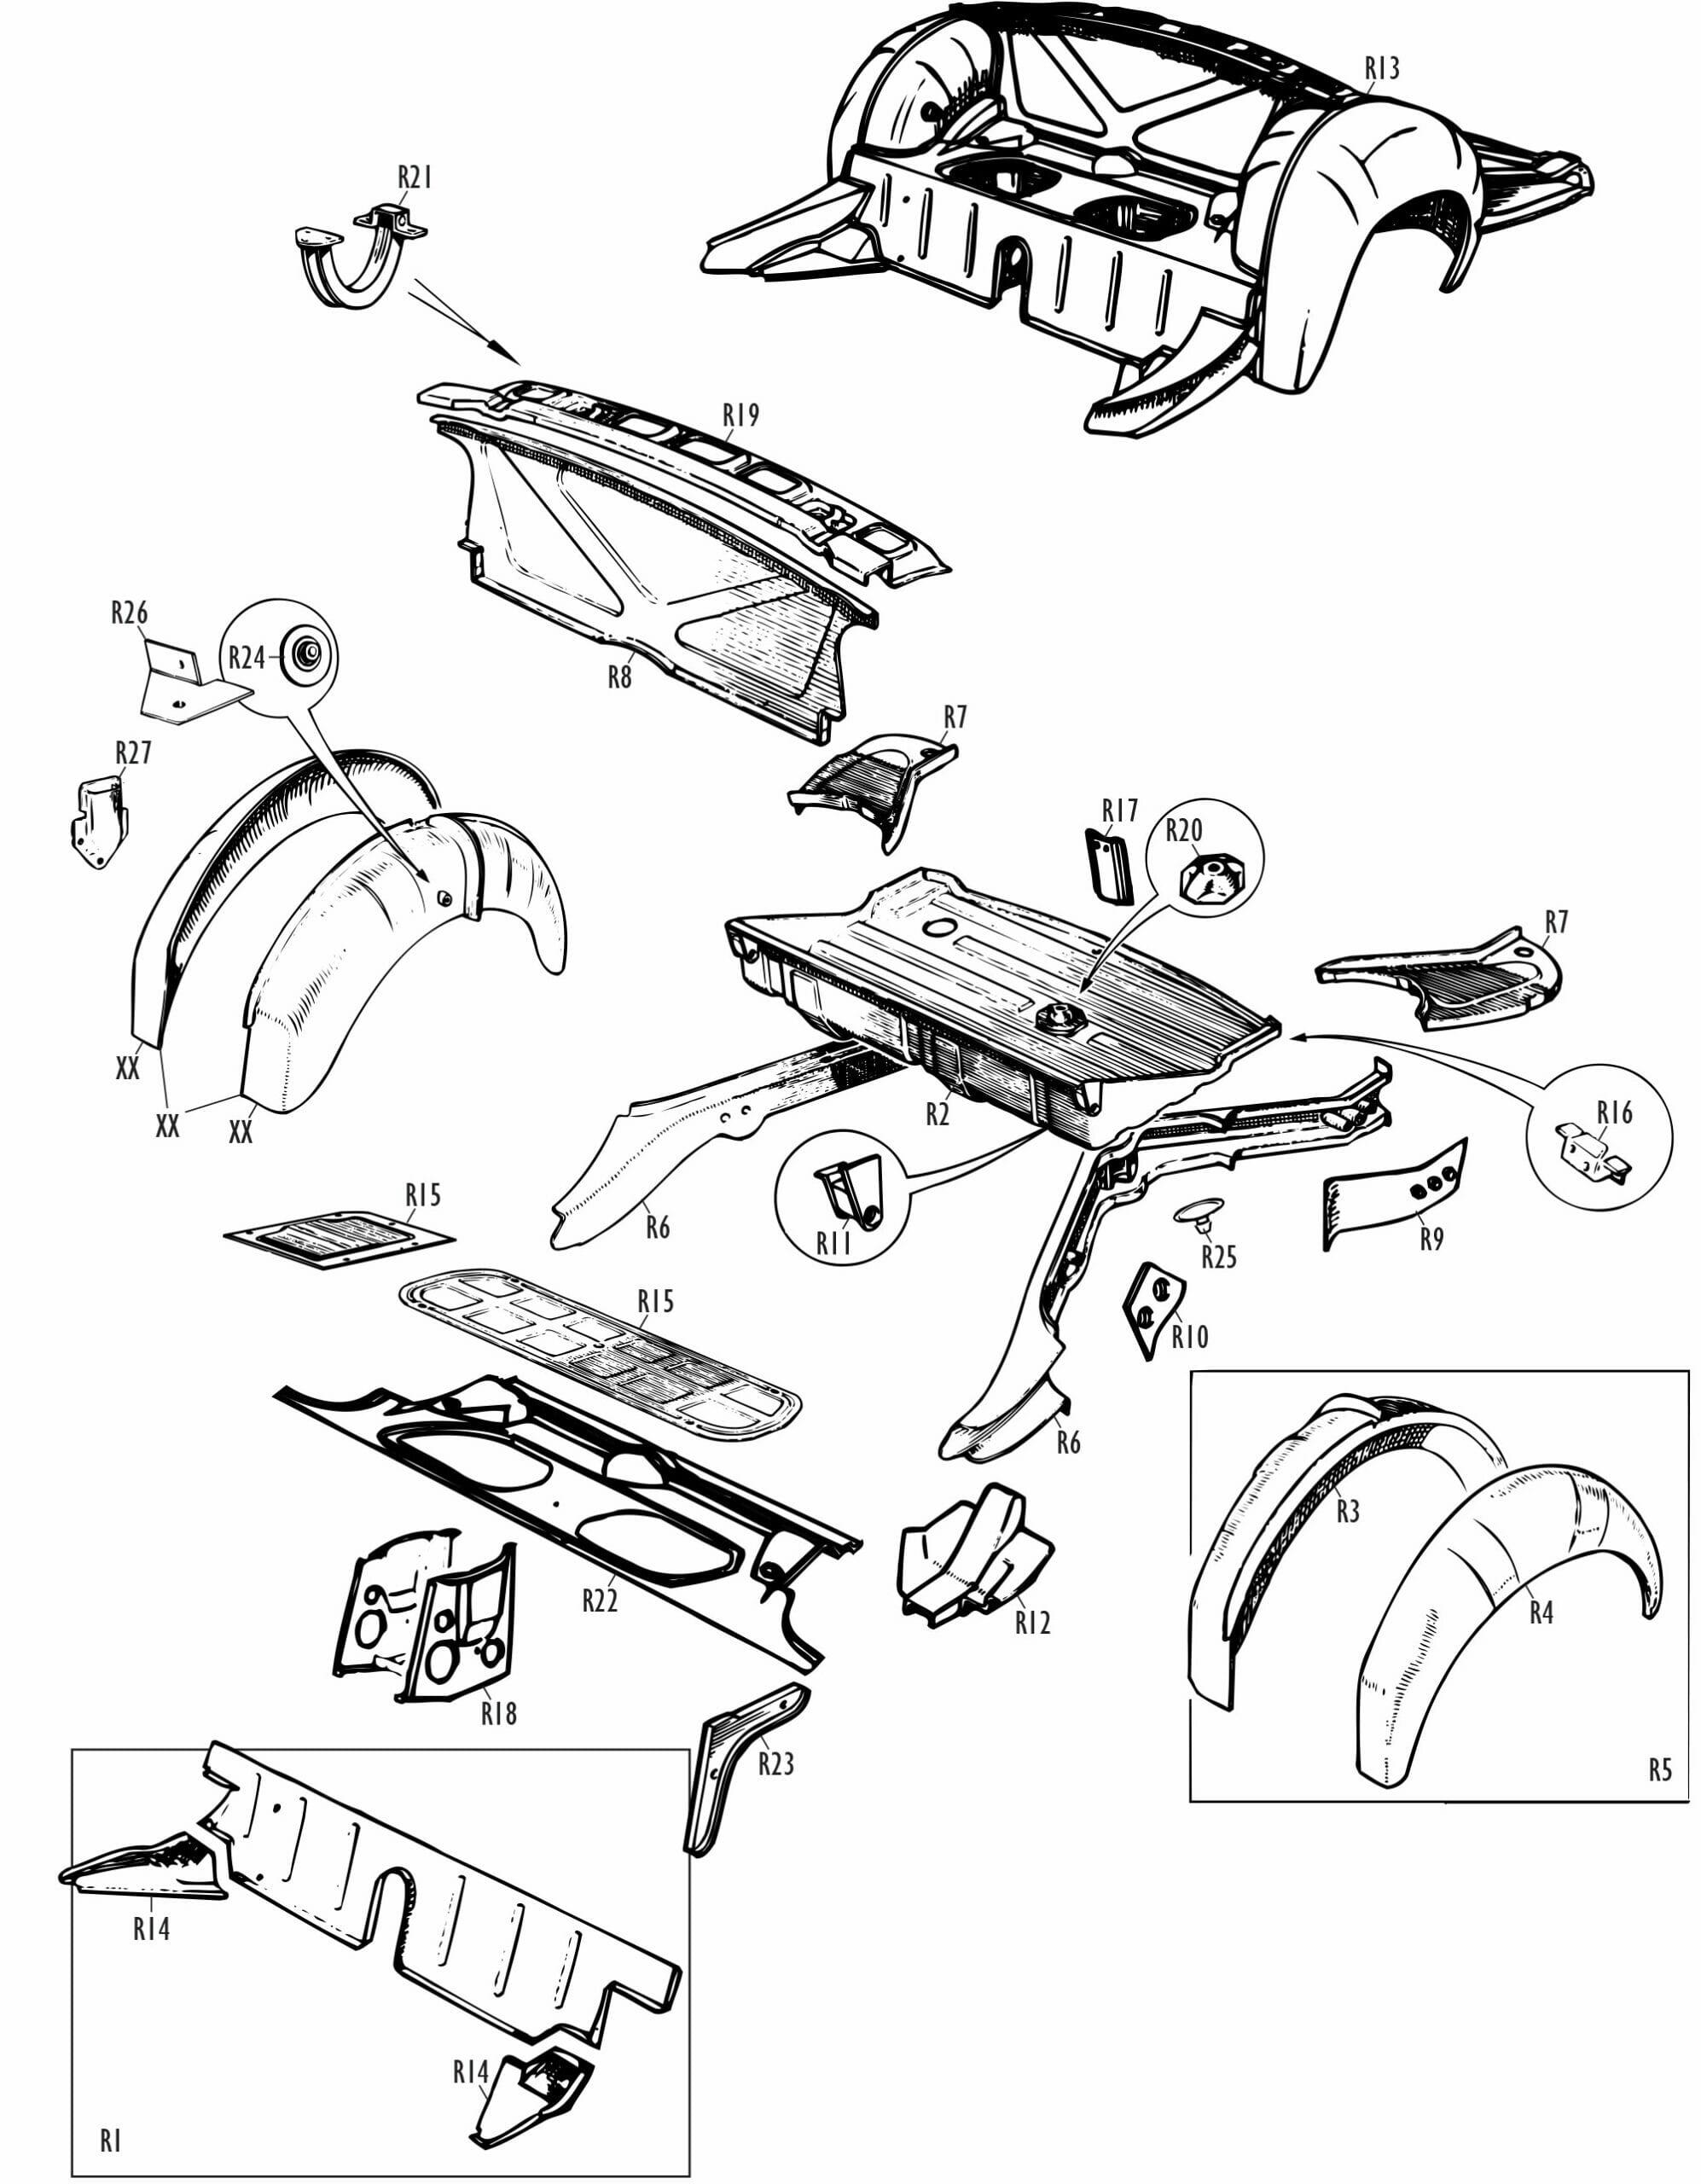 MGB and MGB GT Parts - MGB Rear Body